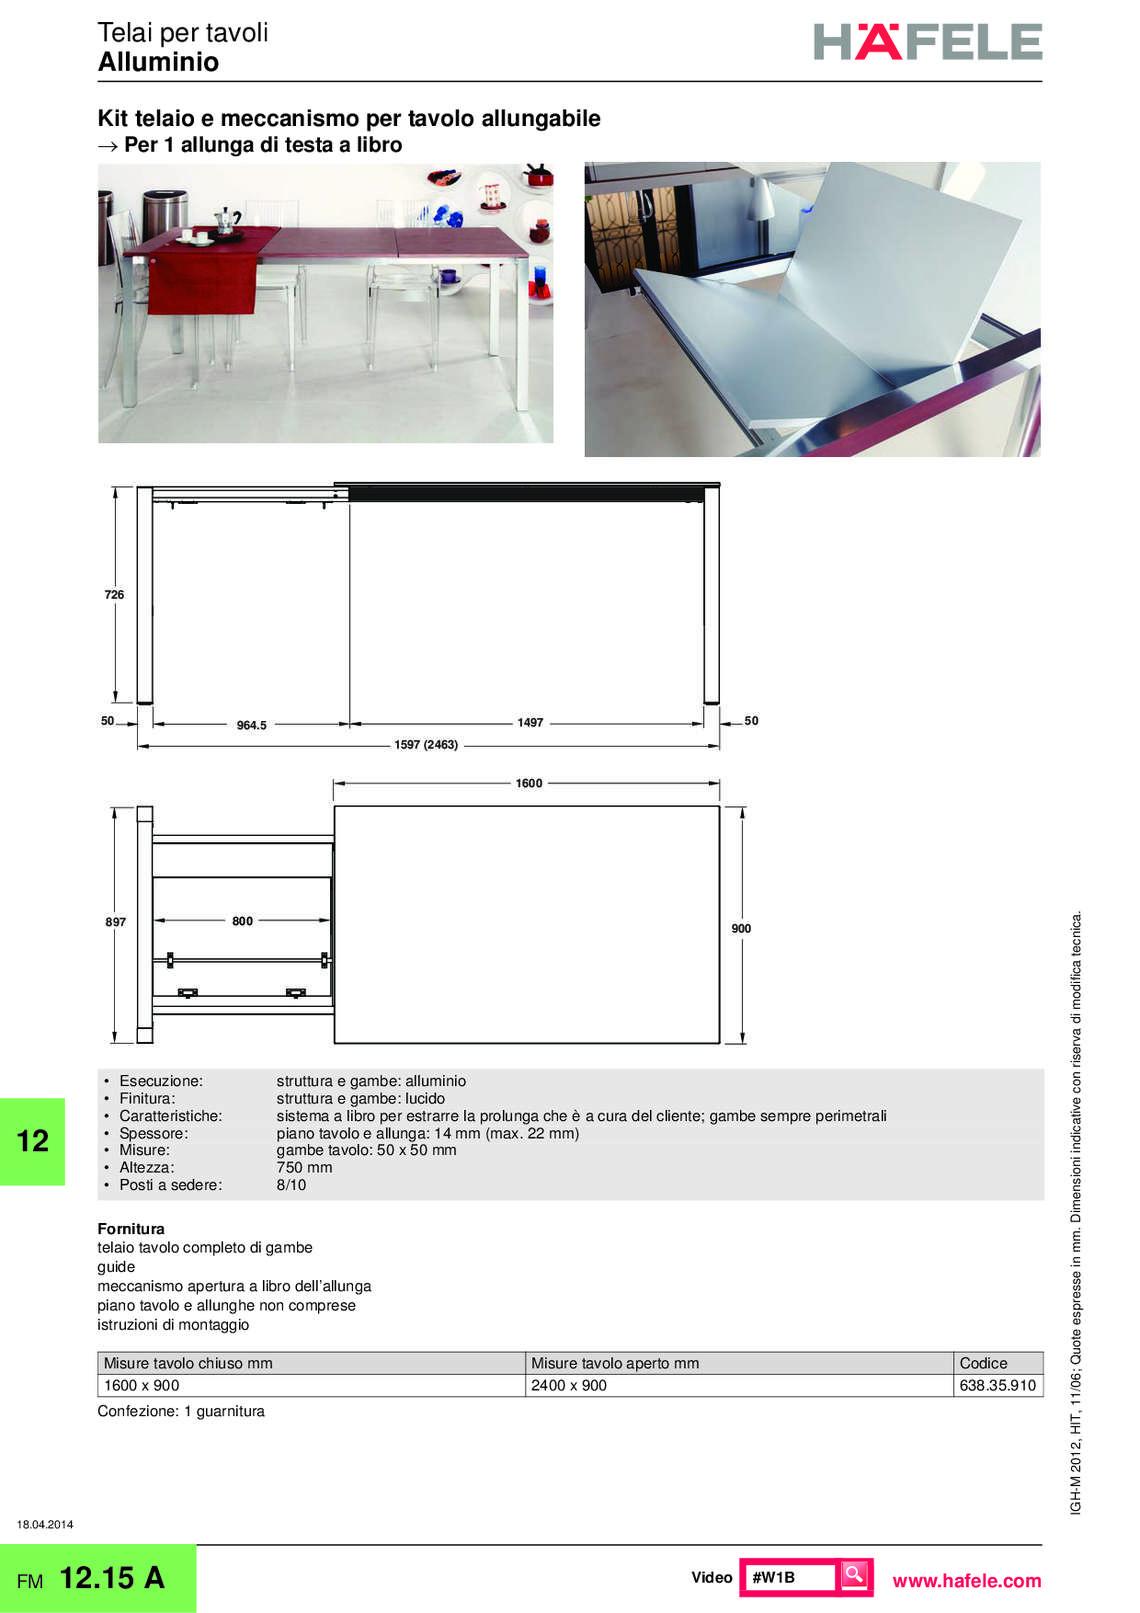 hafele-sottostrutture-per-mobili_83_027.jpg